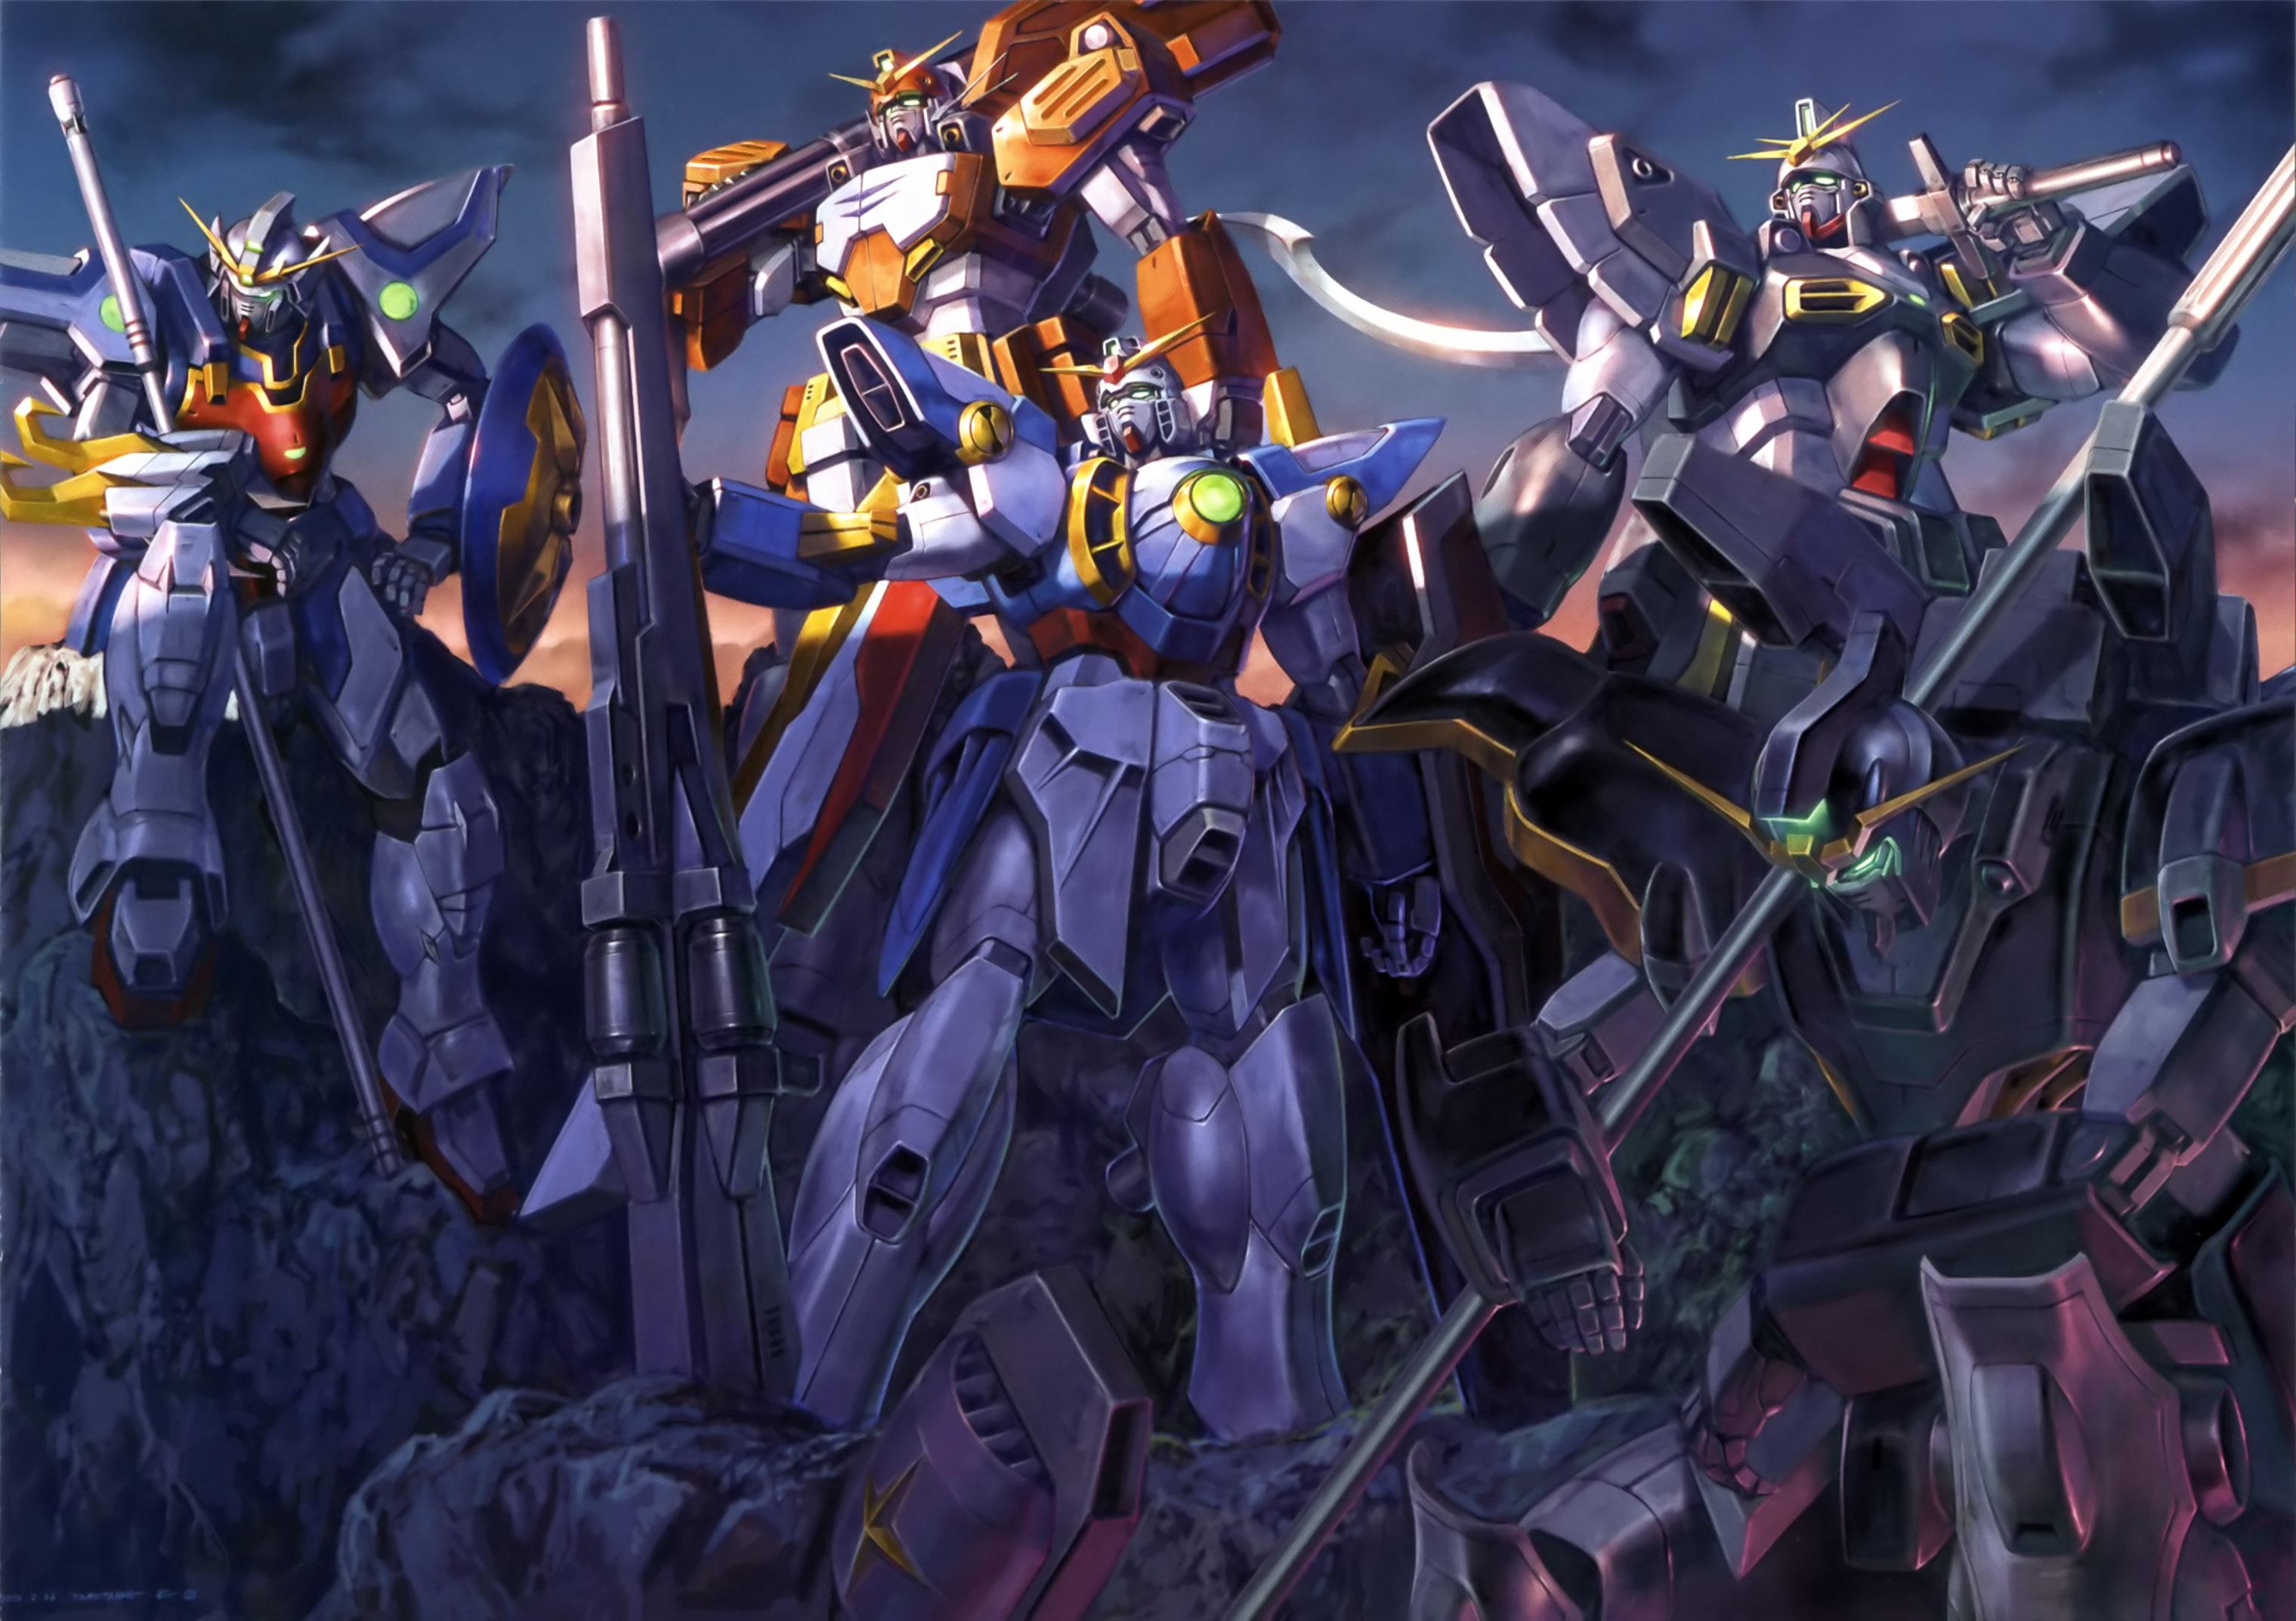 5_Gundams_GW.jpg (JPEG-Grafik, 3039×2145 Pixel) - Skaliert (60%)